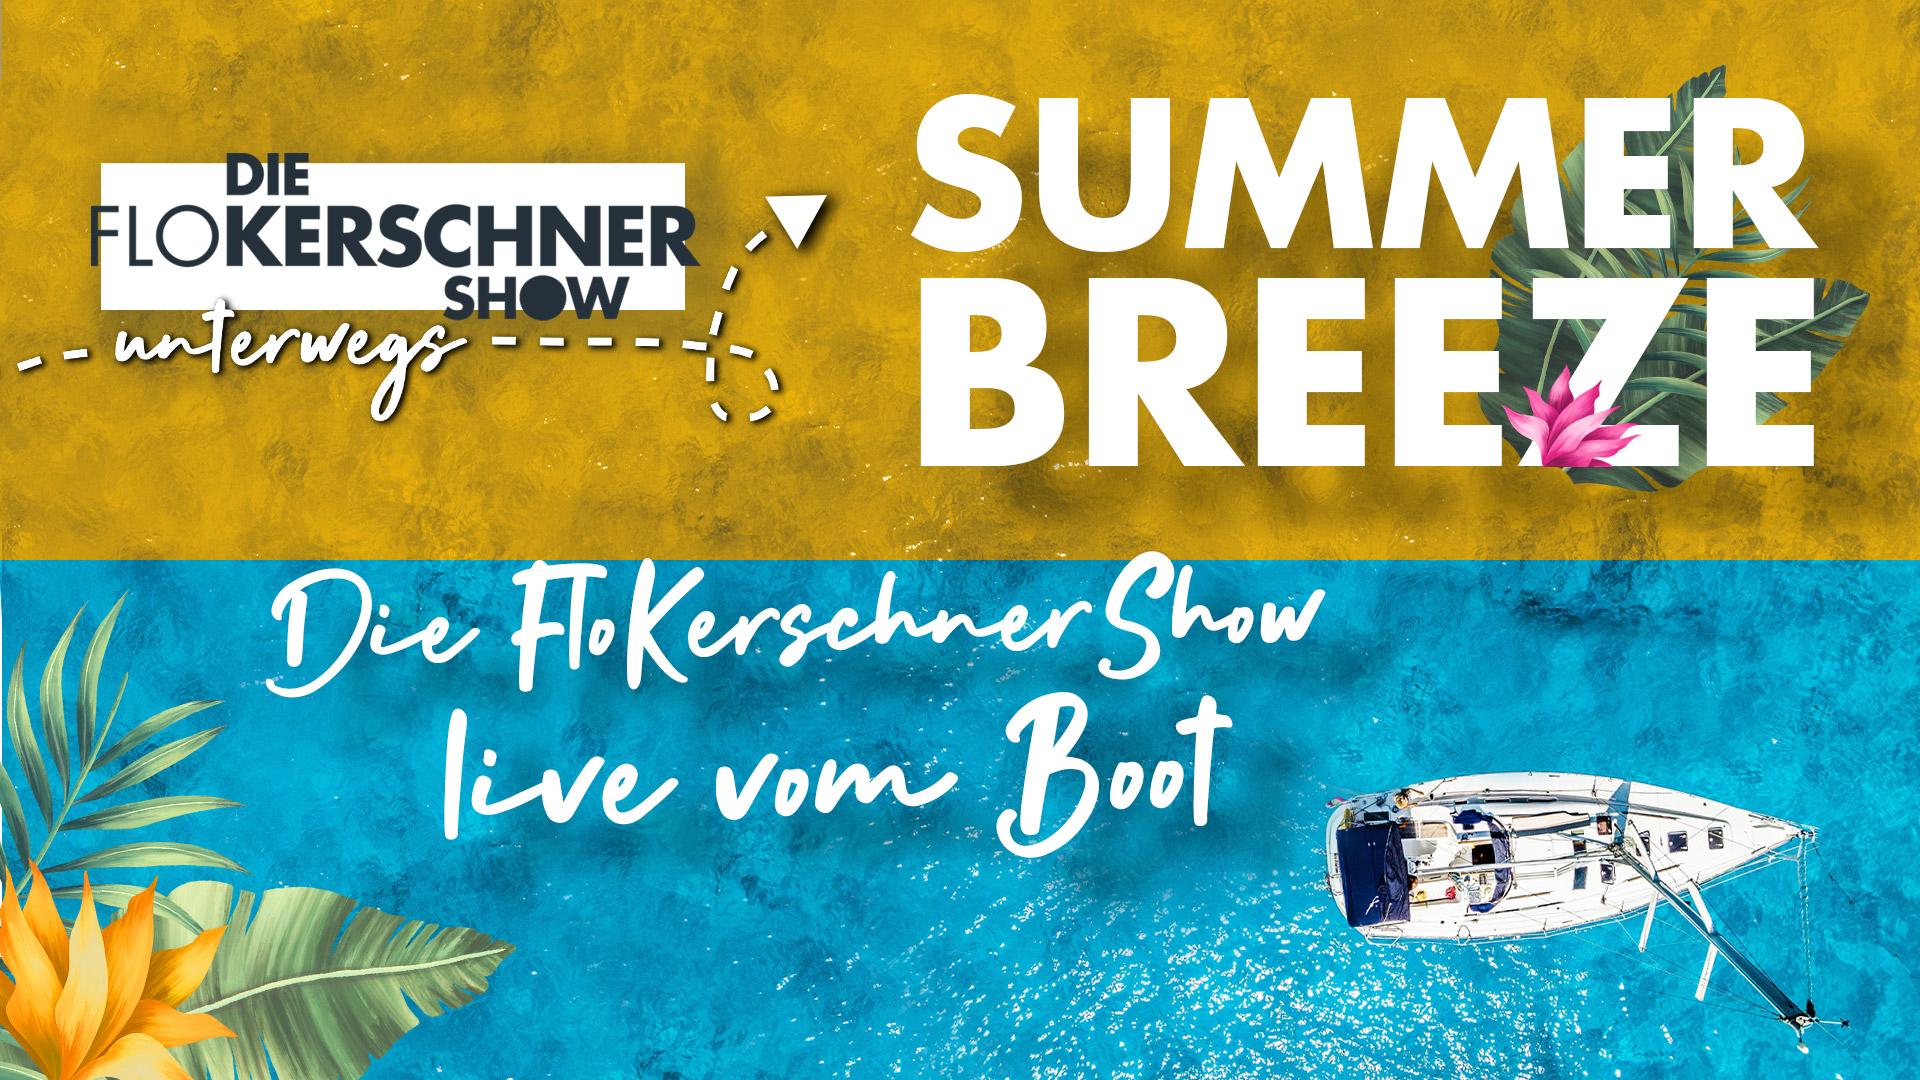 Die Flo Kerschner Show Summer-Breeze